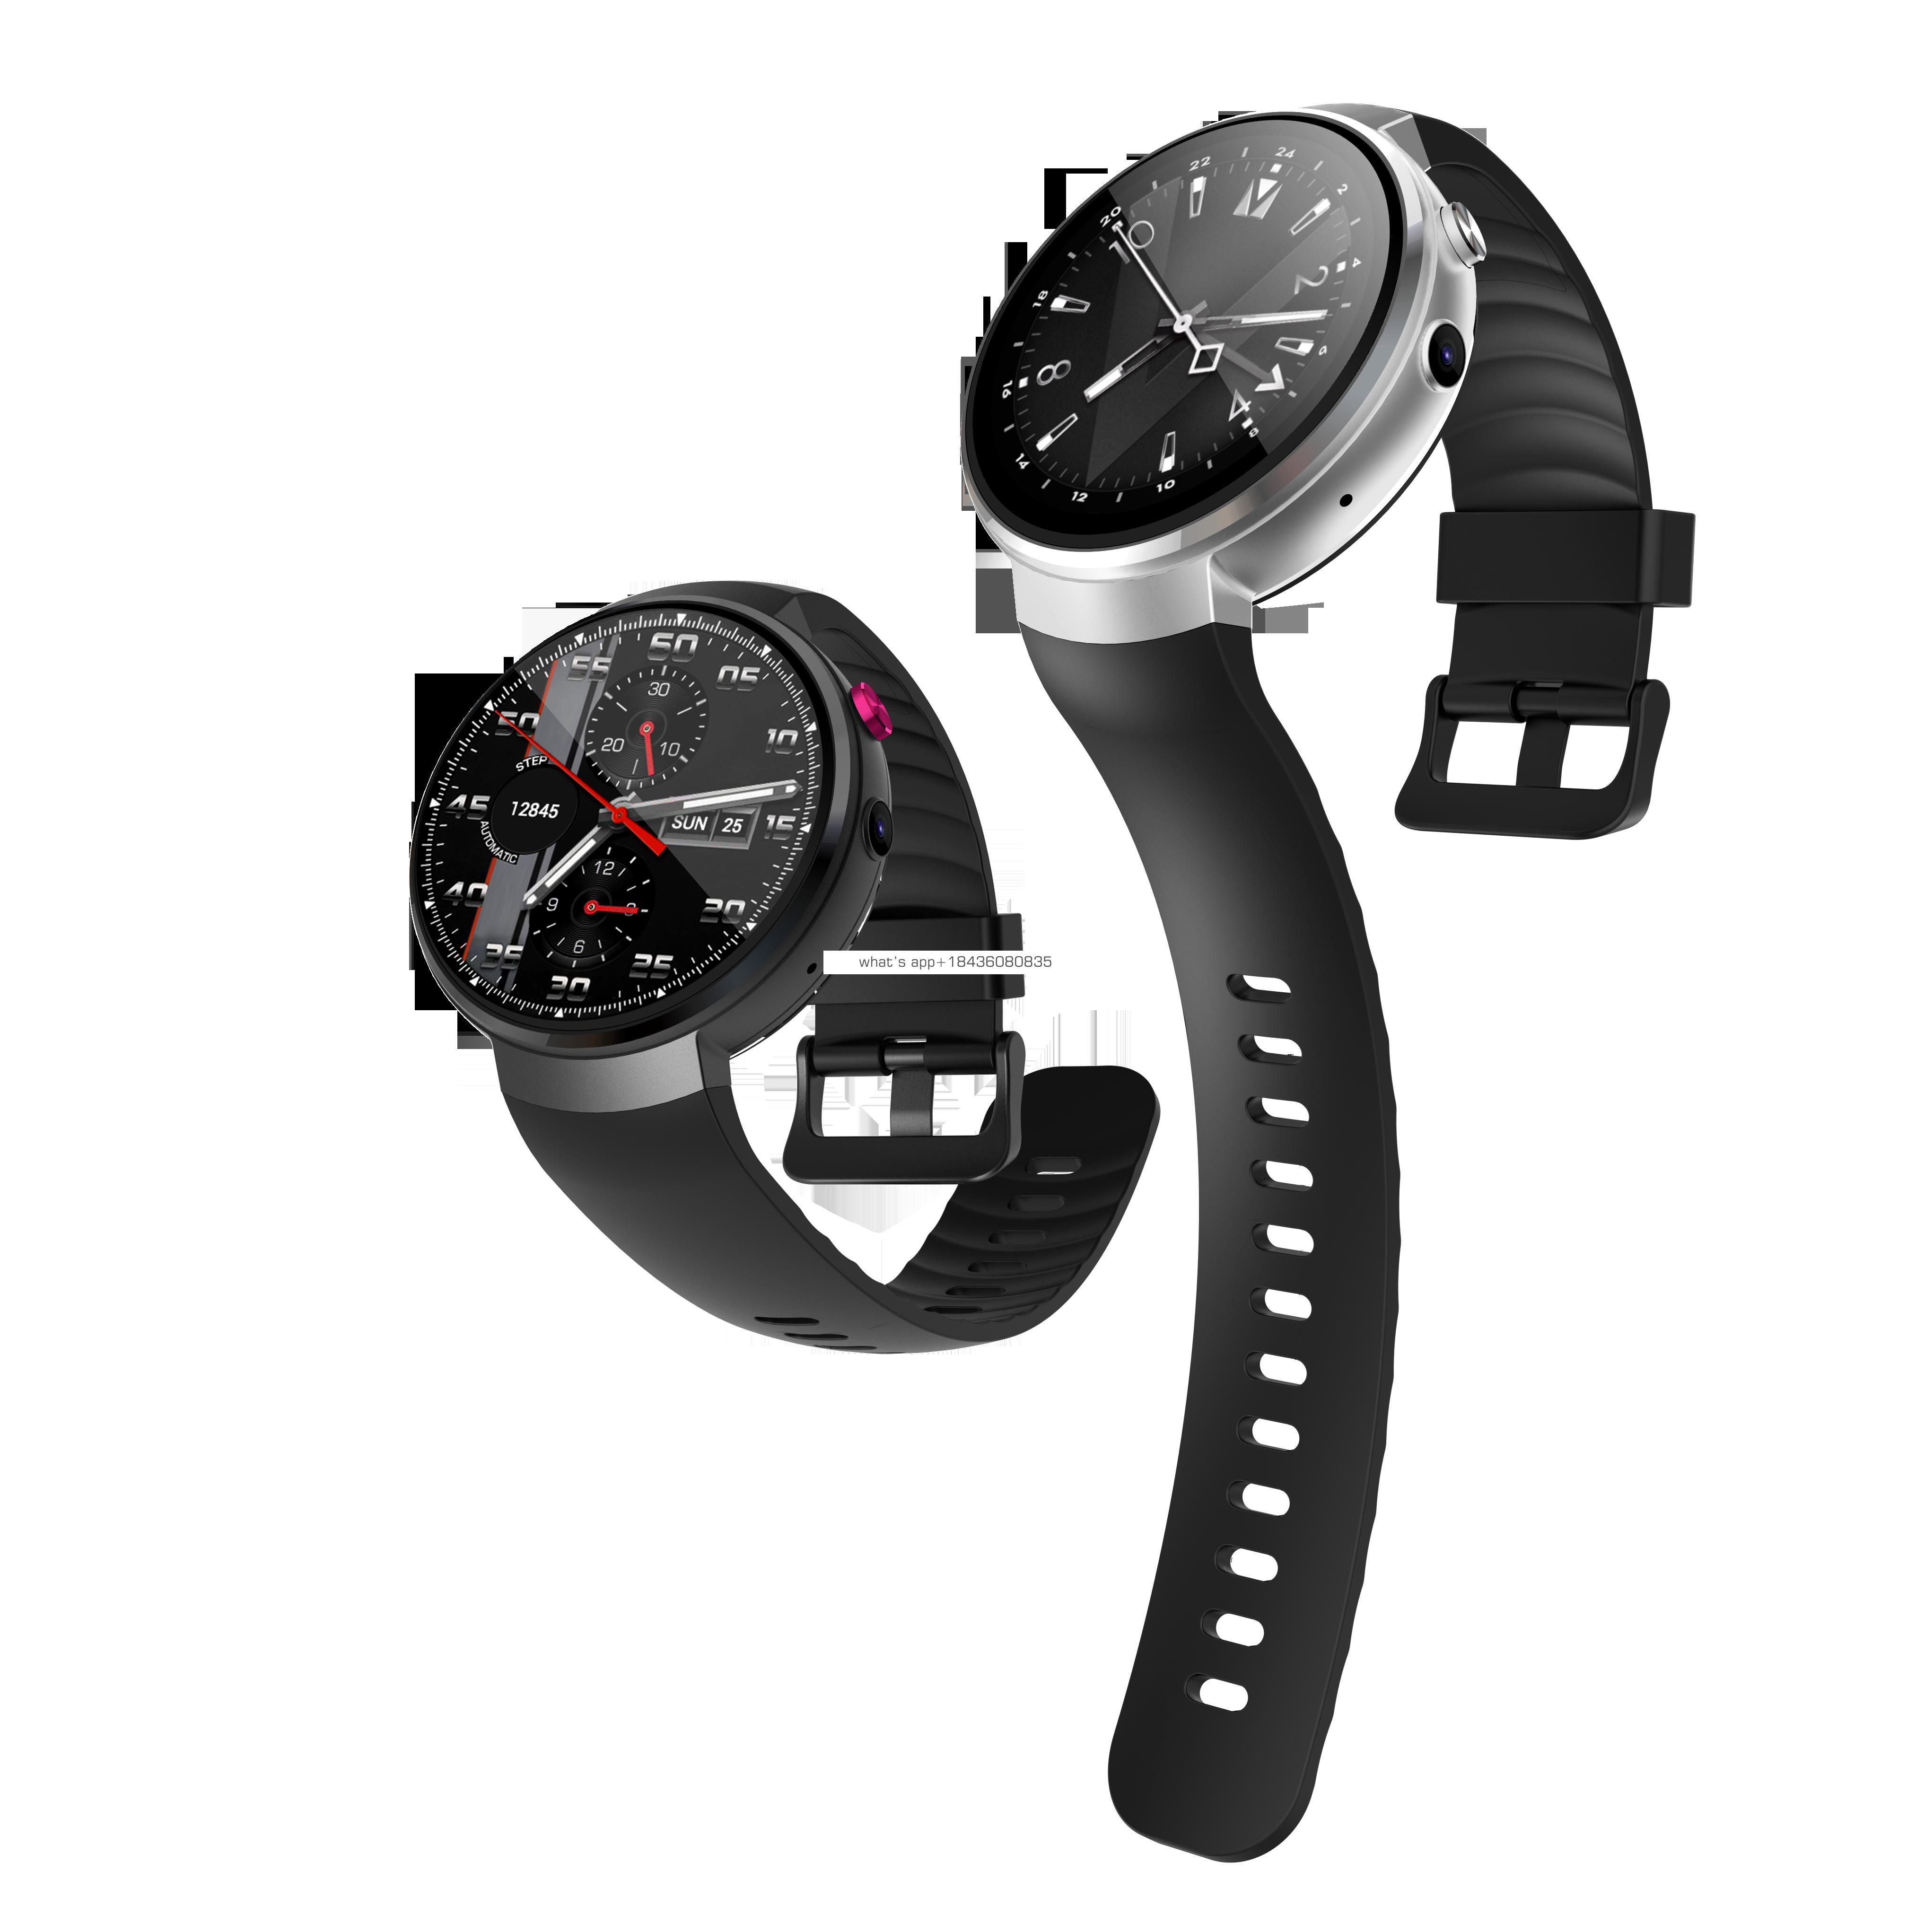 4g Big Color Screen Display mobile phone  watch Reminder Waterproof Outdoor Mens Sports Smartwatch 2019